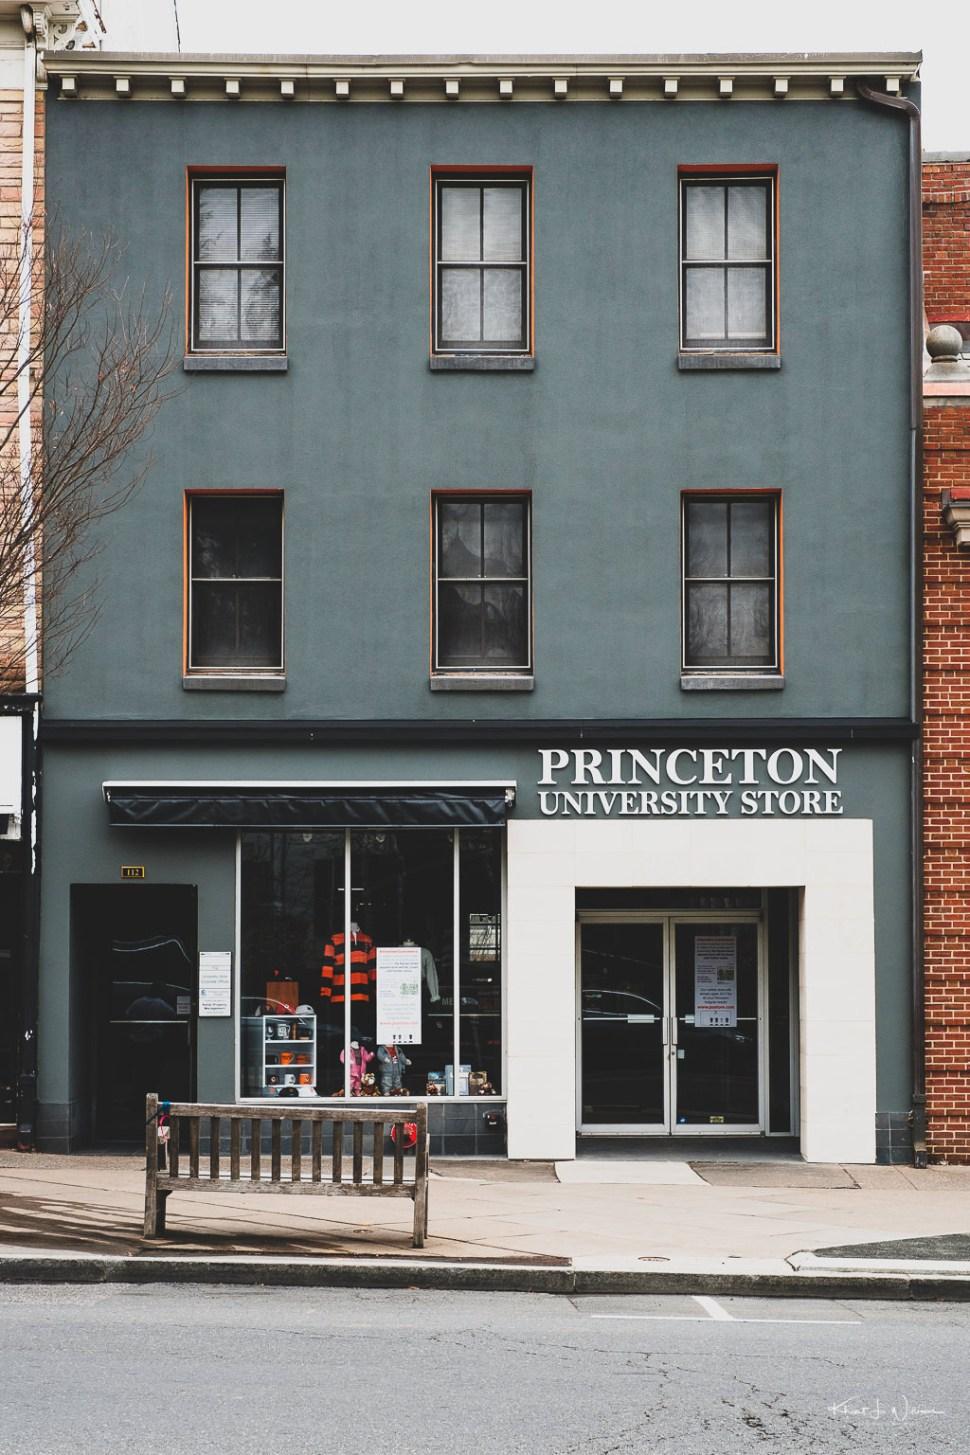 Princeton University Store, Nassau Street, Princeton, New Jersey